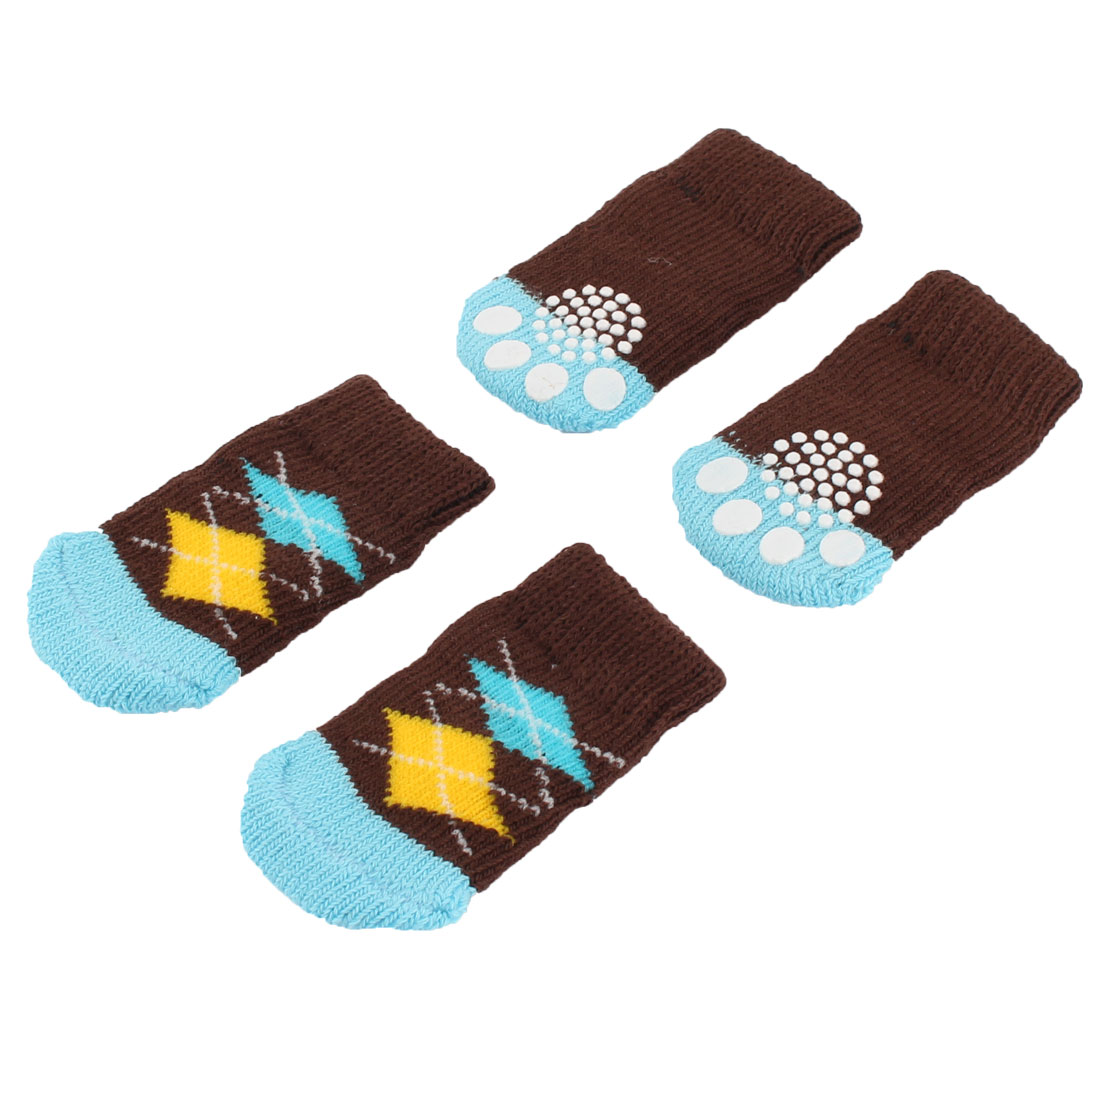 Paw Printed Anti-slip Elastic Skid Bottom Pet Dog Socks Protecters 2 Pairs